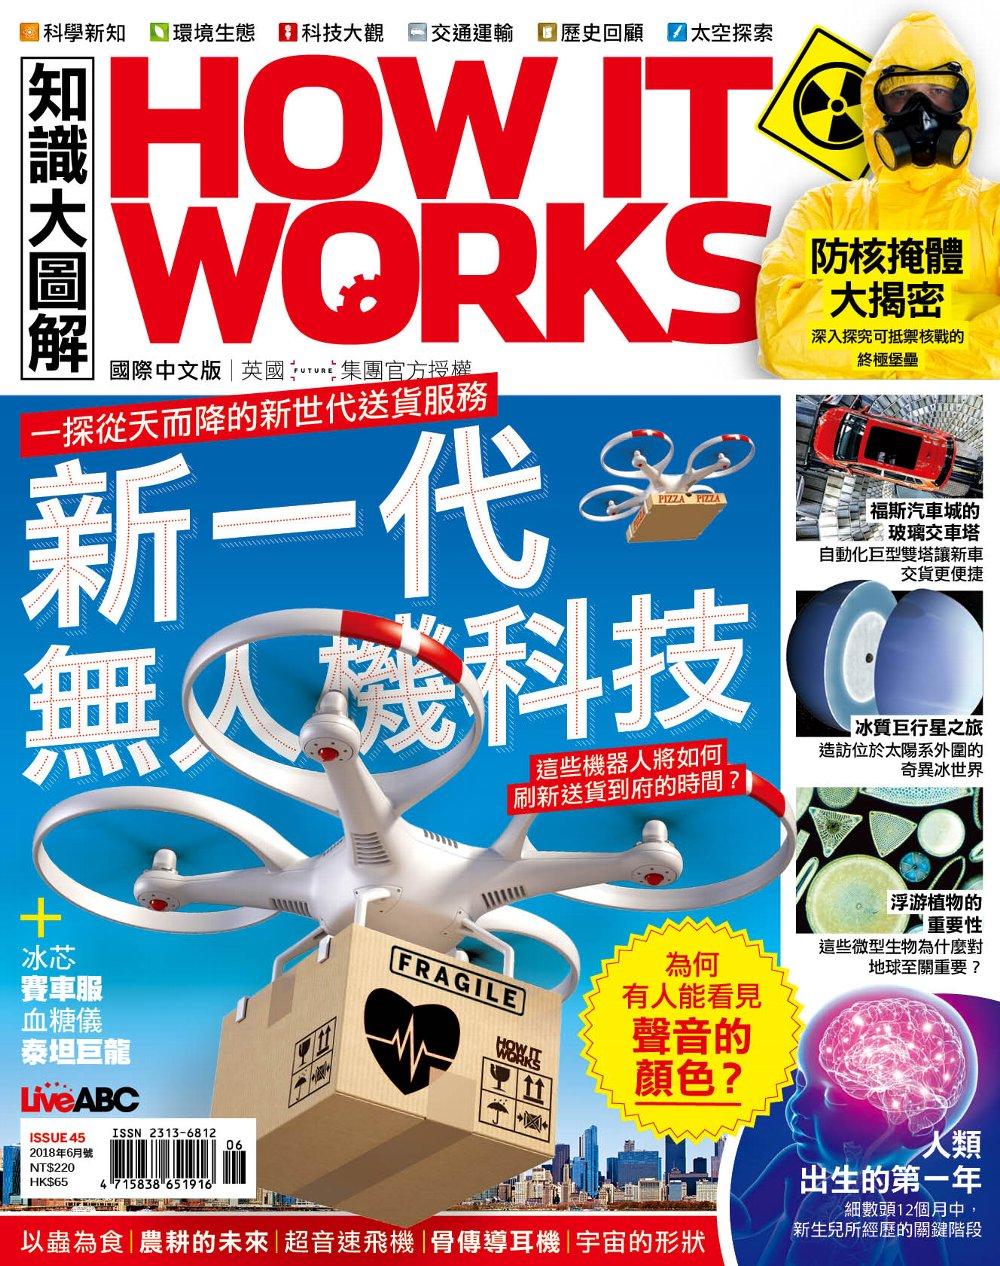 How it works知識大圖解 國際中文版一年12期 +How It Works知識大圖解年度特刊-探索科學的奧妙